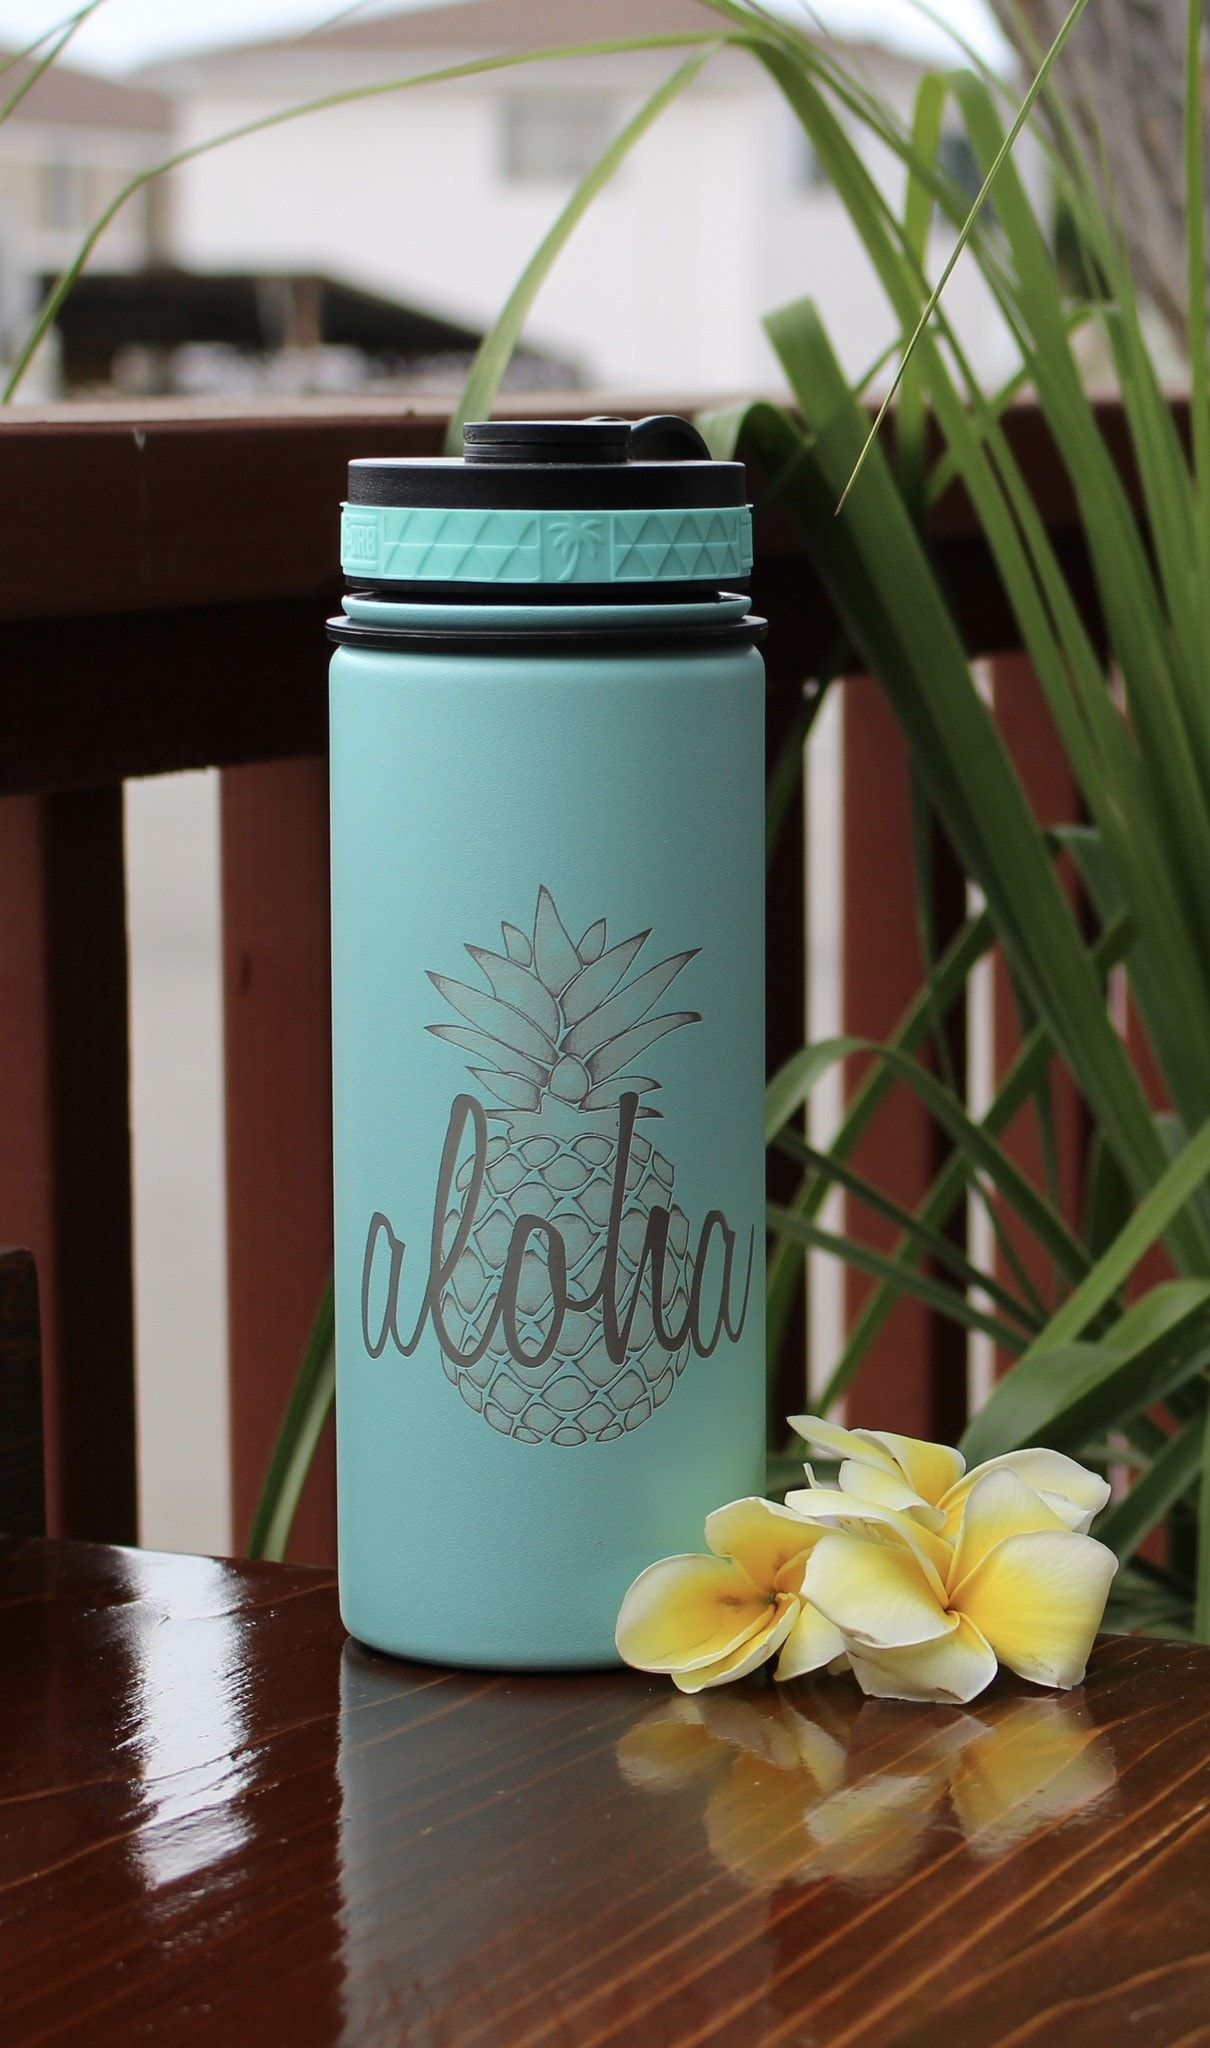 808 HI-DR8, Flask, 18oz, Aloha Pineapple Engraving   Hydro ...